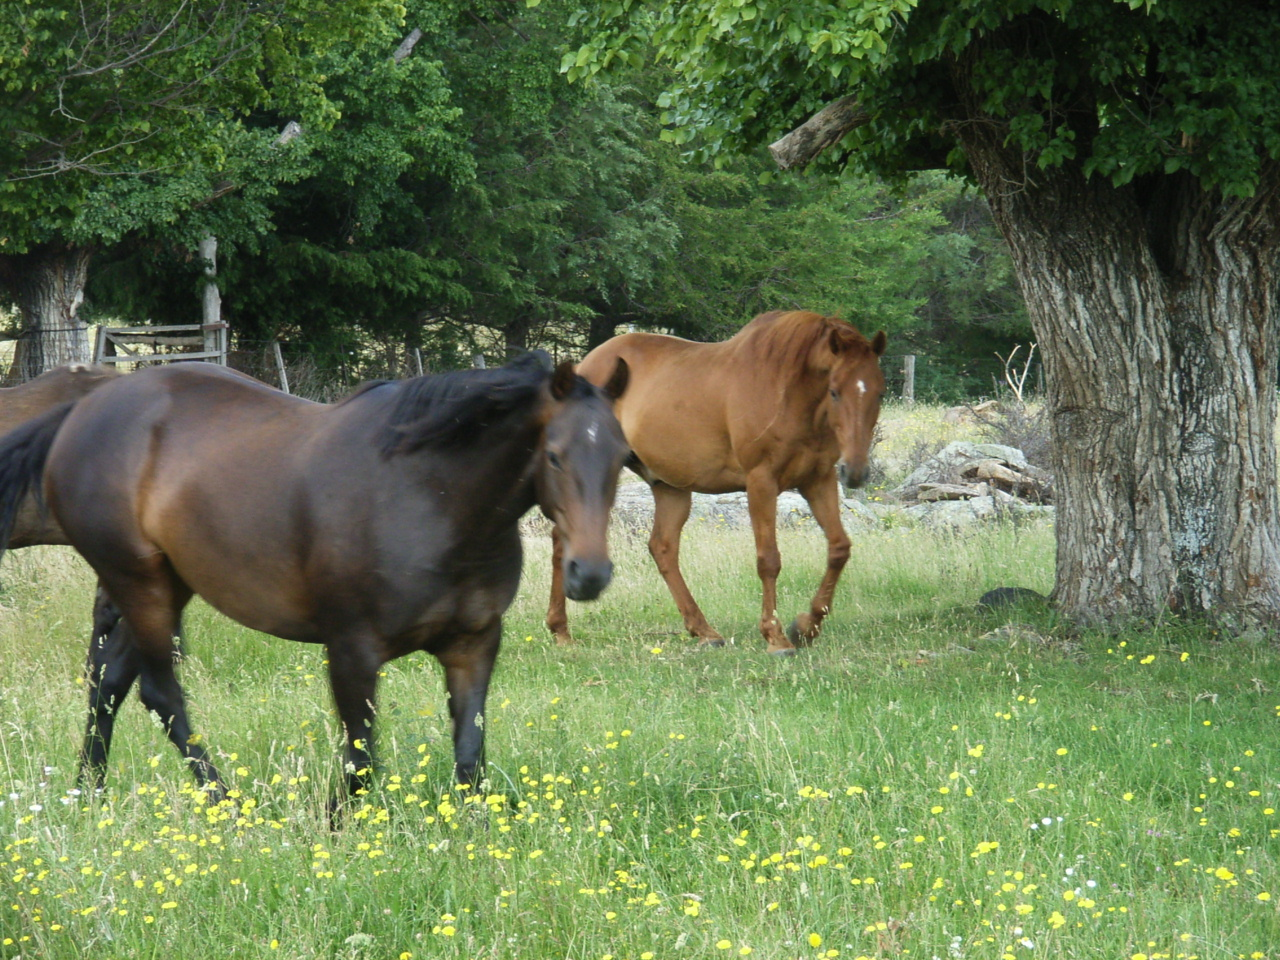 Farm Activities - Meet the horses